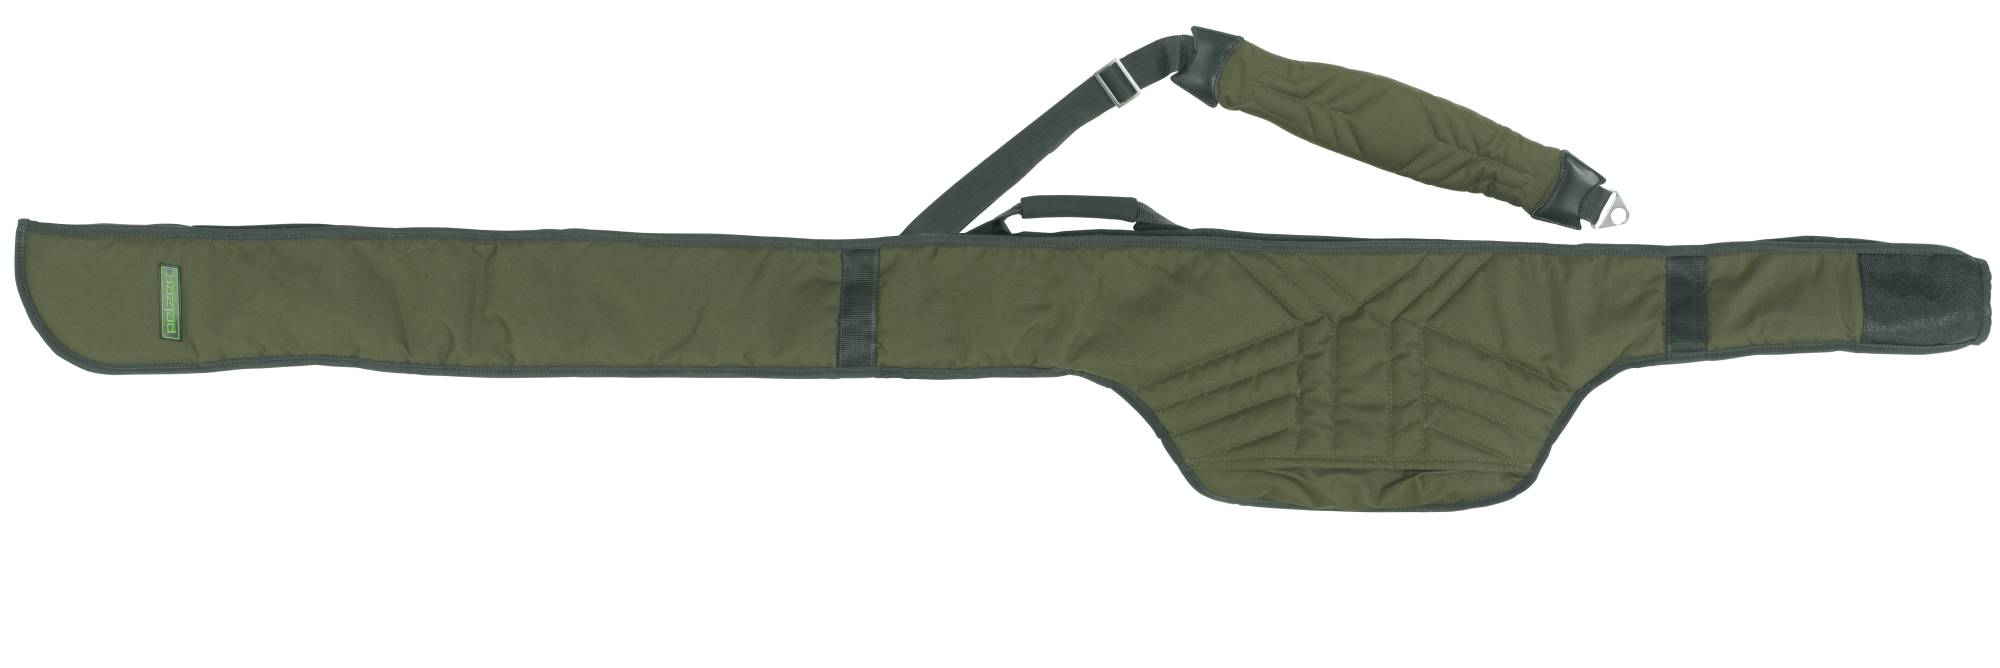 Pelzer/Executive Double Rod Sleeve 12